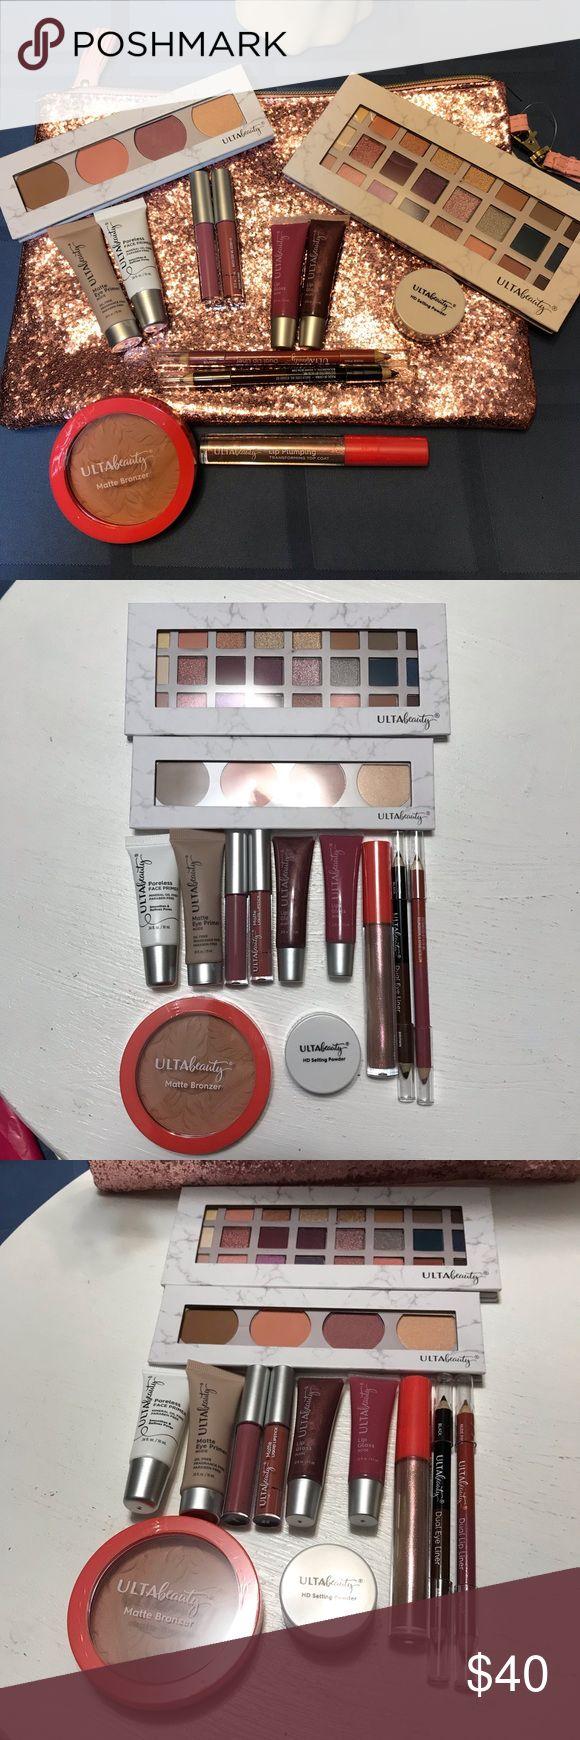 Ulta Beauty 13 piece pro makeup kit. Great for someone